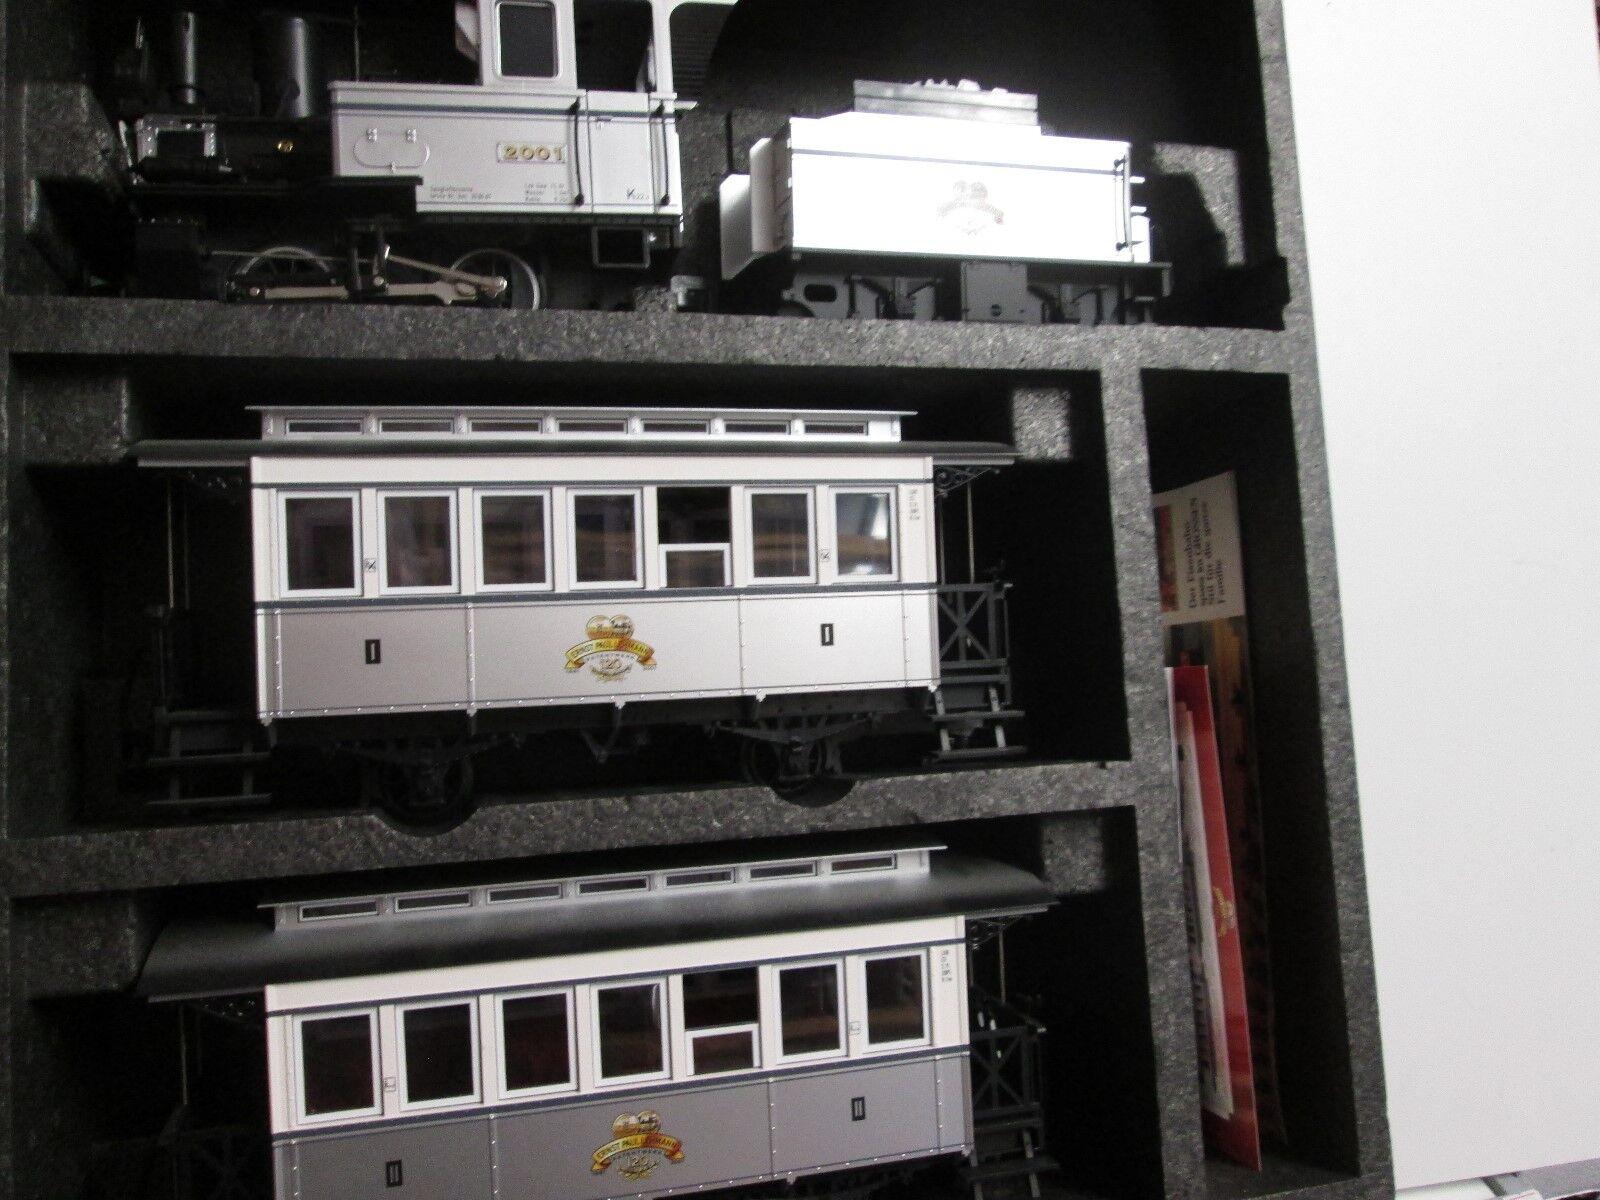 LGB 29151+47280 persone-Zugset 120 anni LGB con carri merci